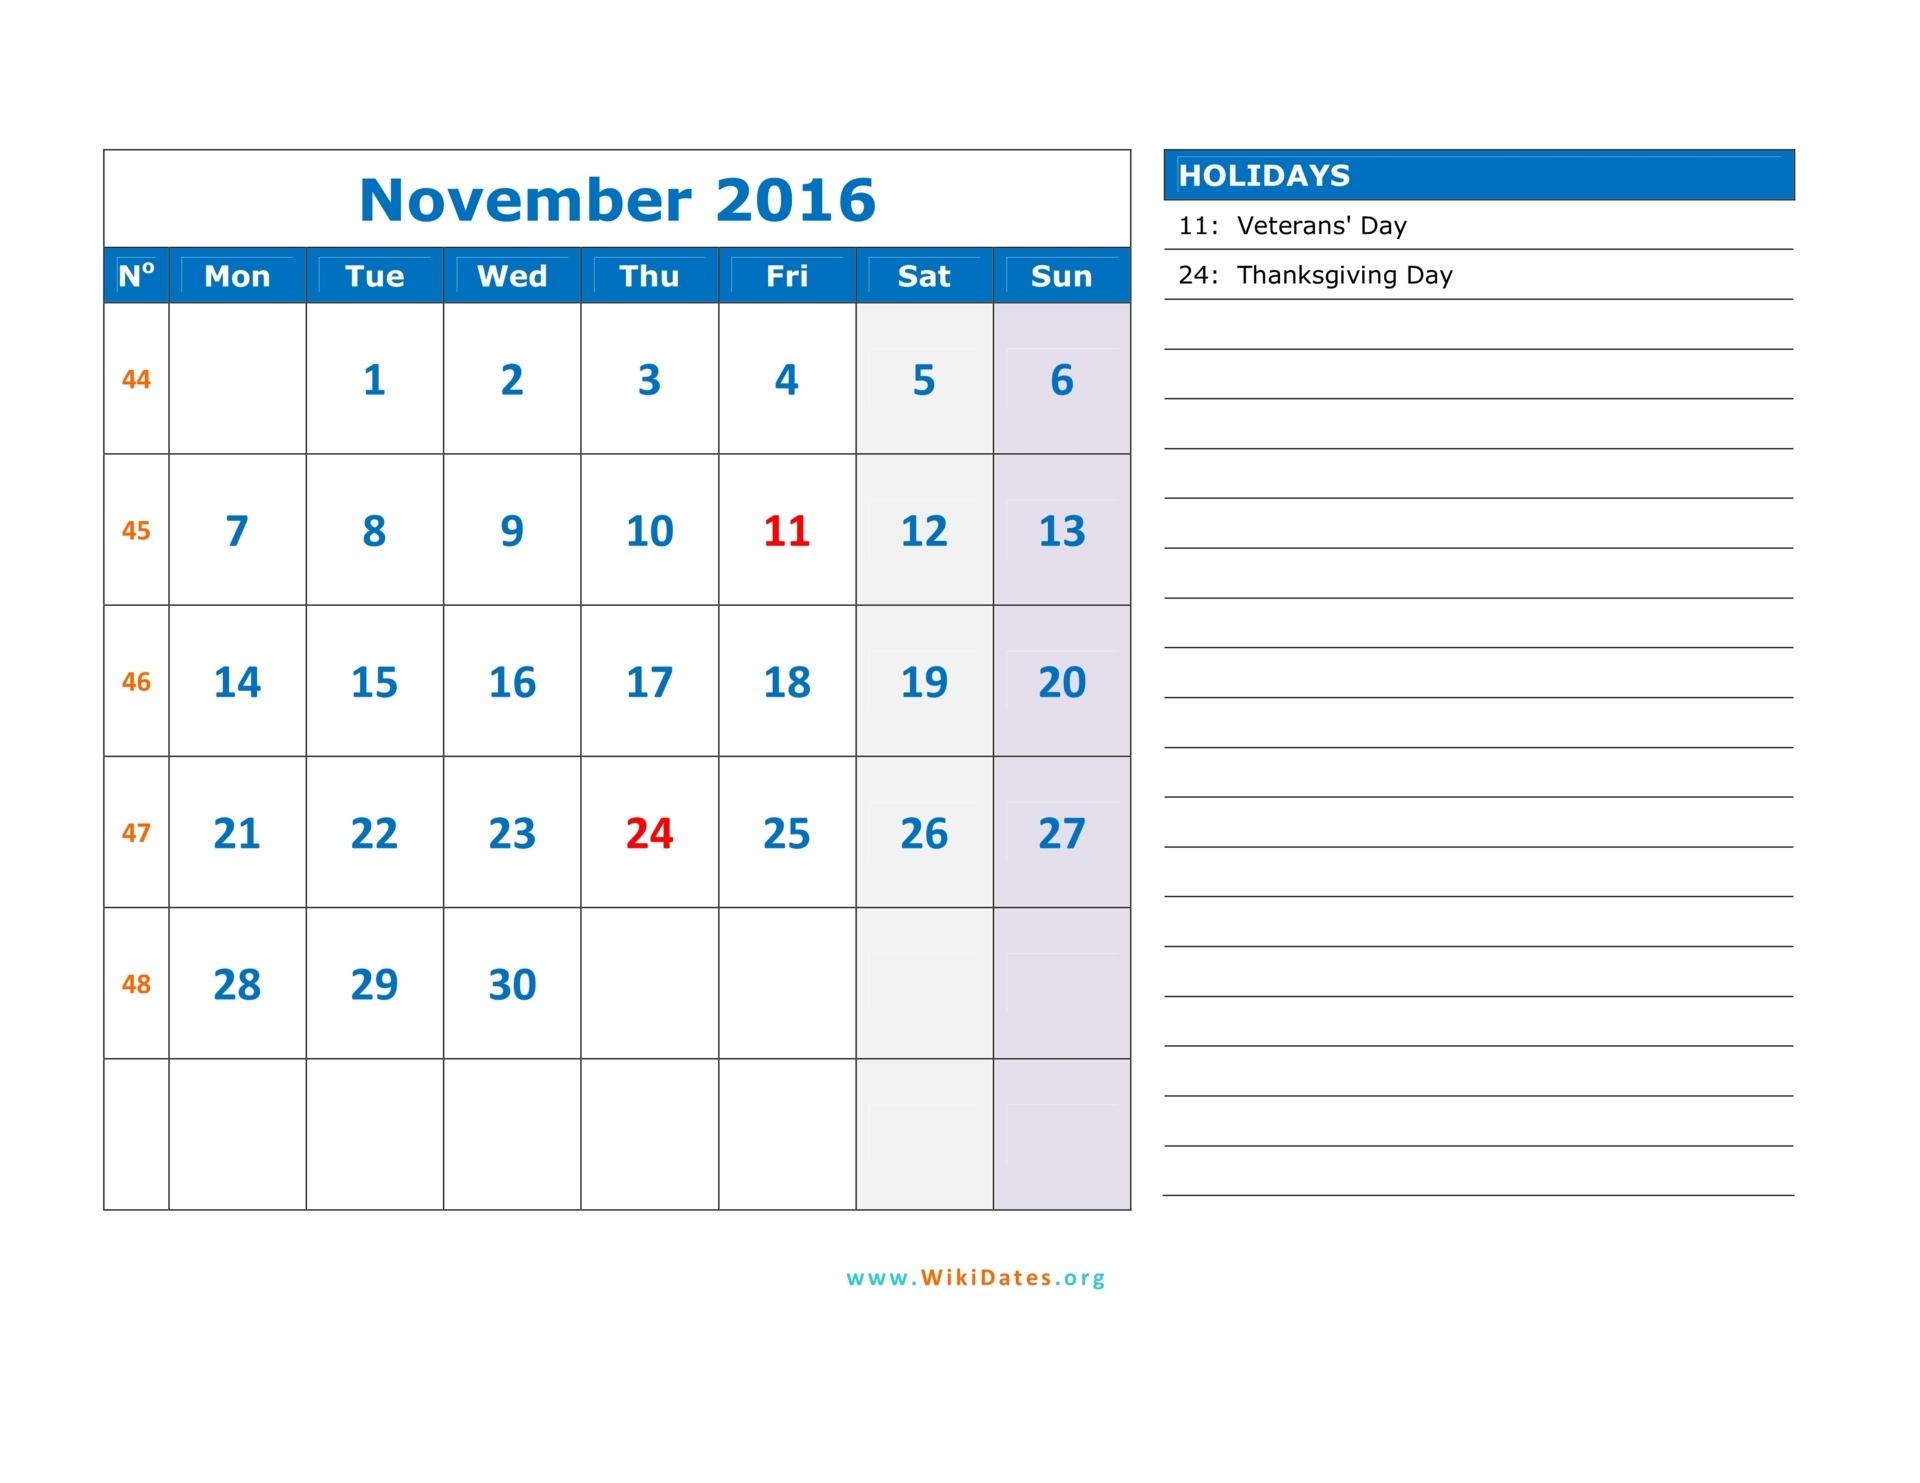 November 2016 Calendar | WikiDates.org